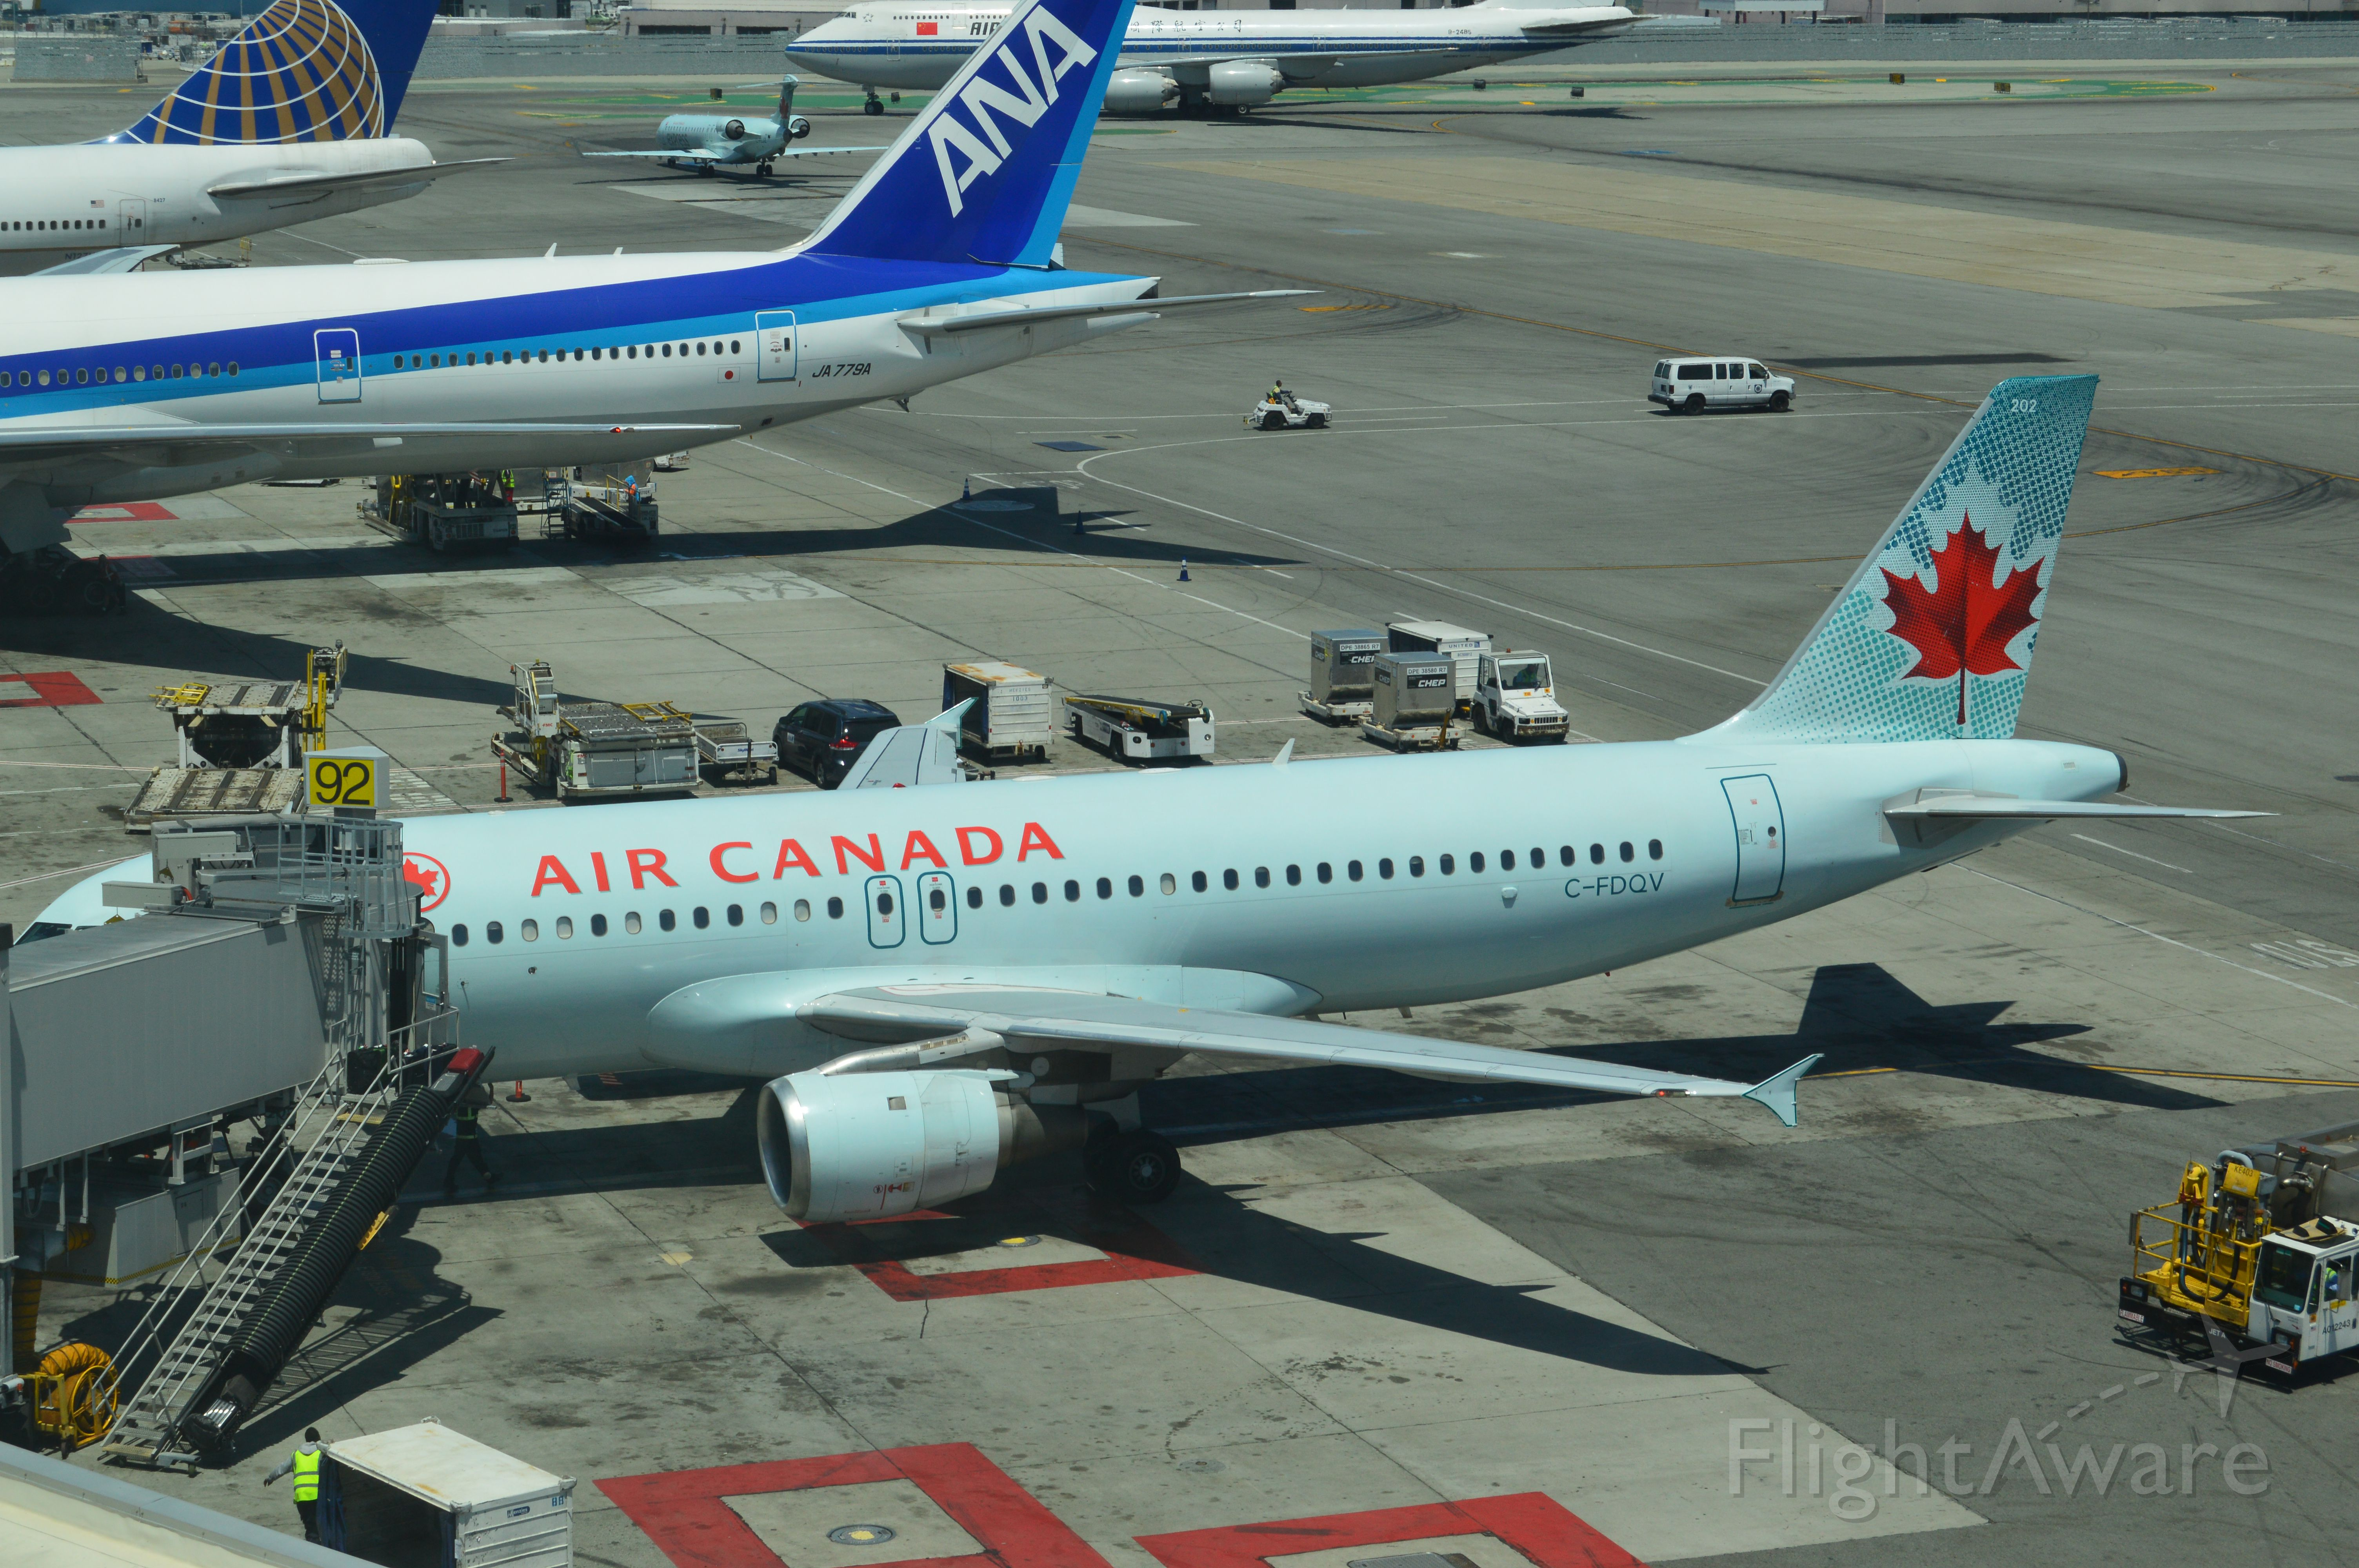 Airbus A320 (C-FDQV) - International noontime traffic at SFO